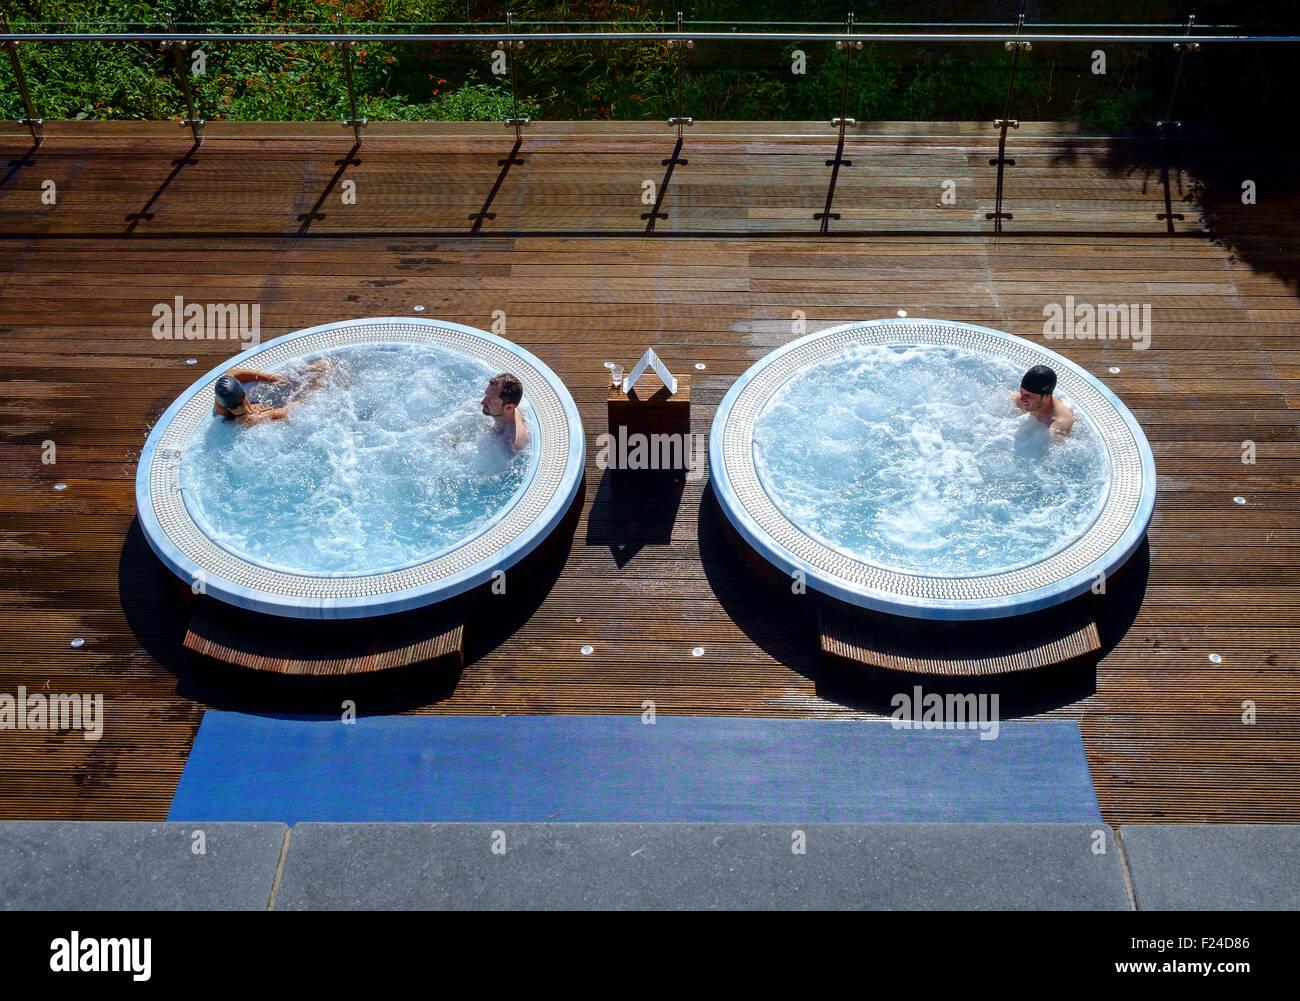 Jacuzzi bagno esterno circolare bagnanti vasca calda Immagini Stock